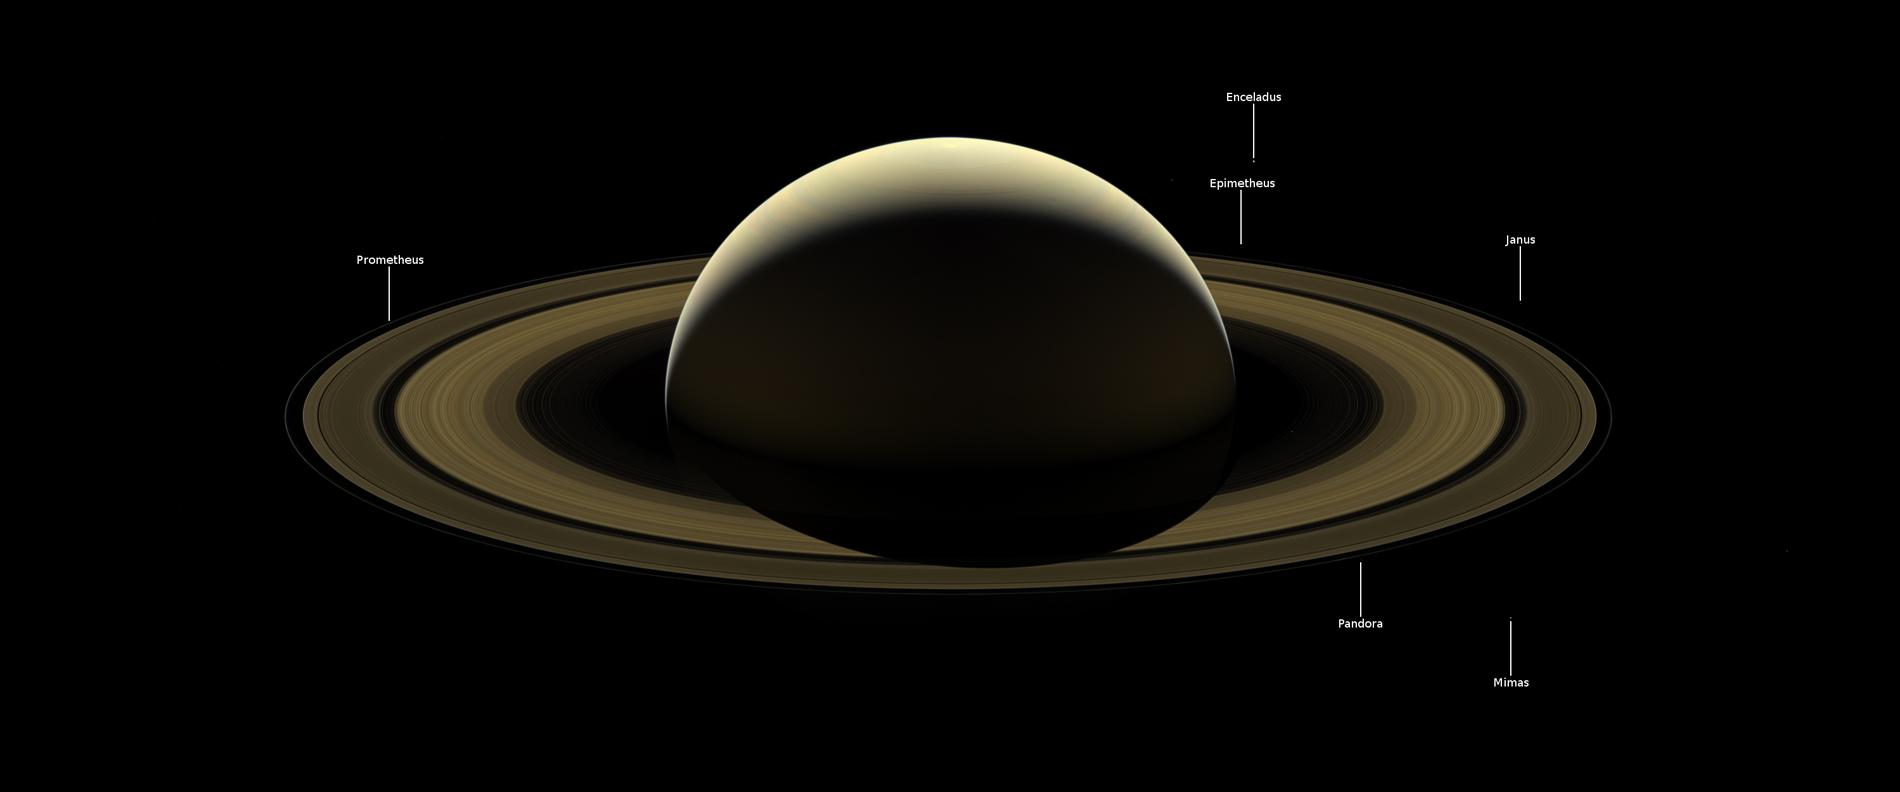 portrait de Saturne